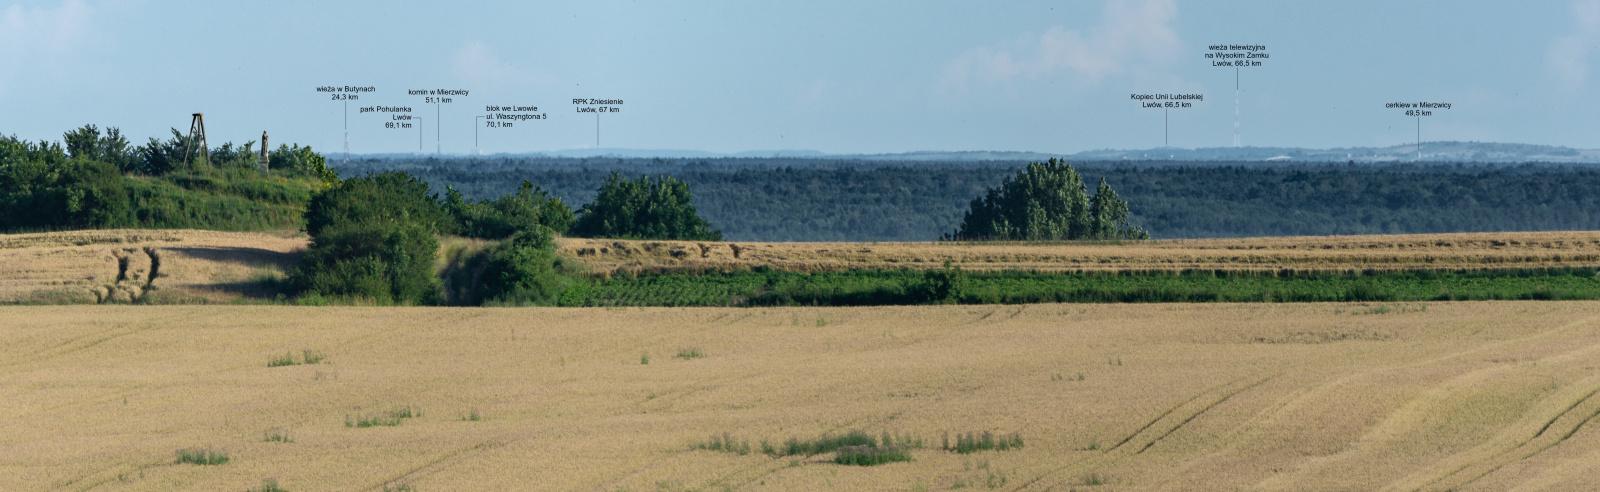 lwow-panorama.thumb.jpg.01c6b05a6629012243d63f86ebb09f73.jpg